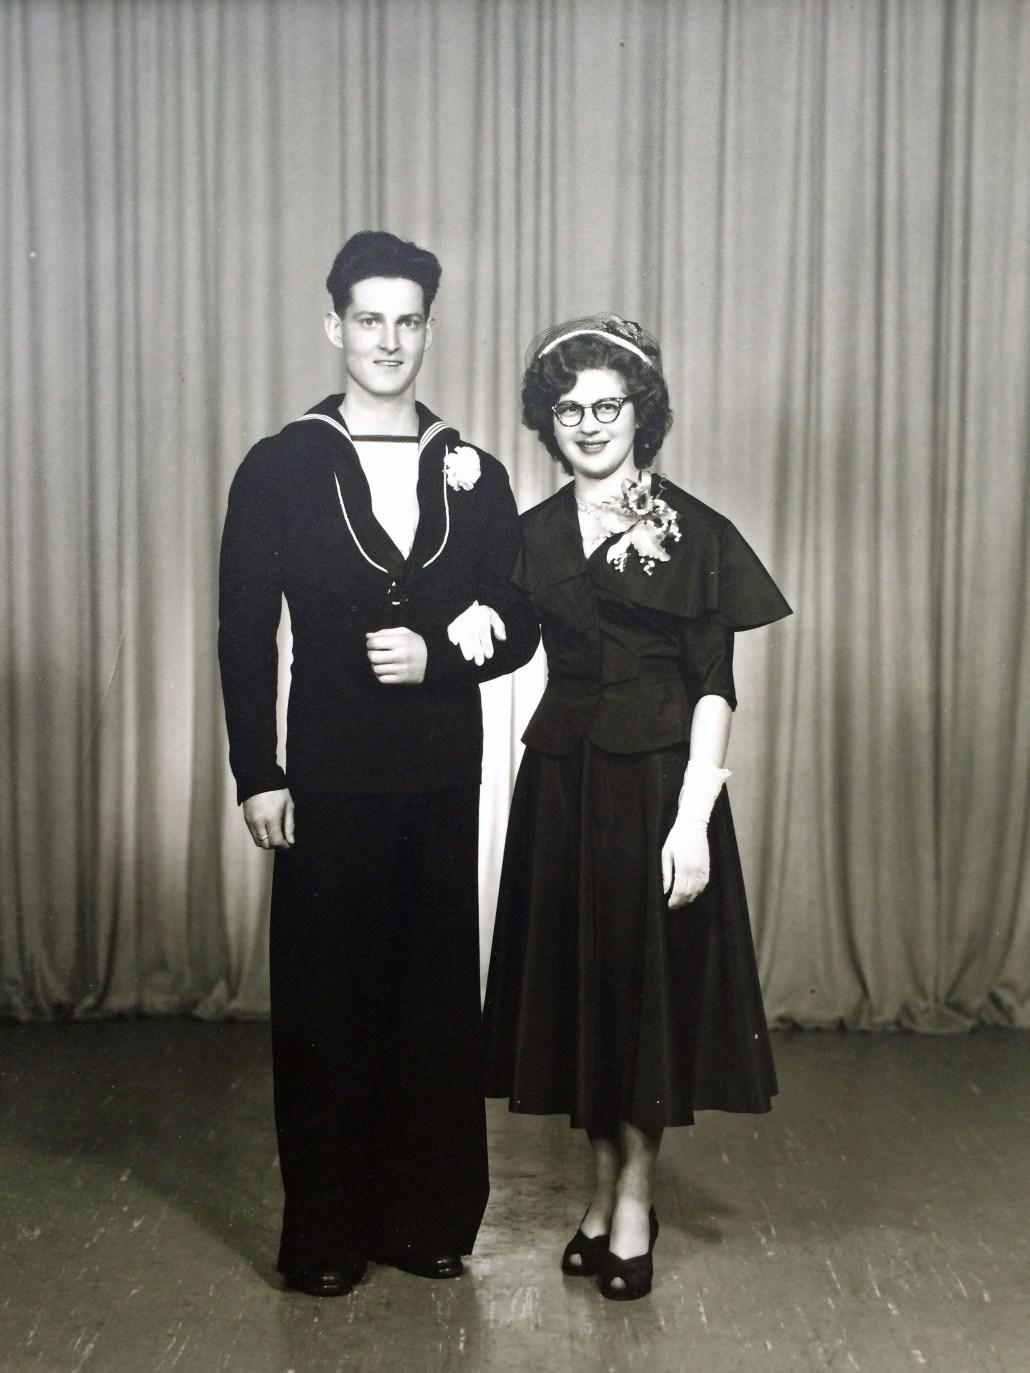 Elsie and Al wedding portrait, 1952. Image courtesy of Elsie Henderson.